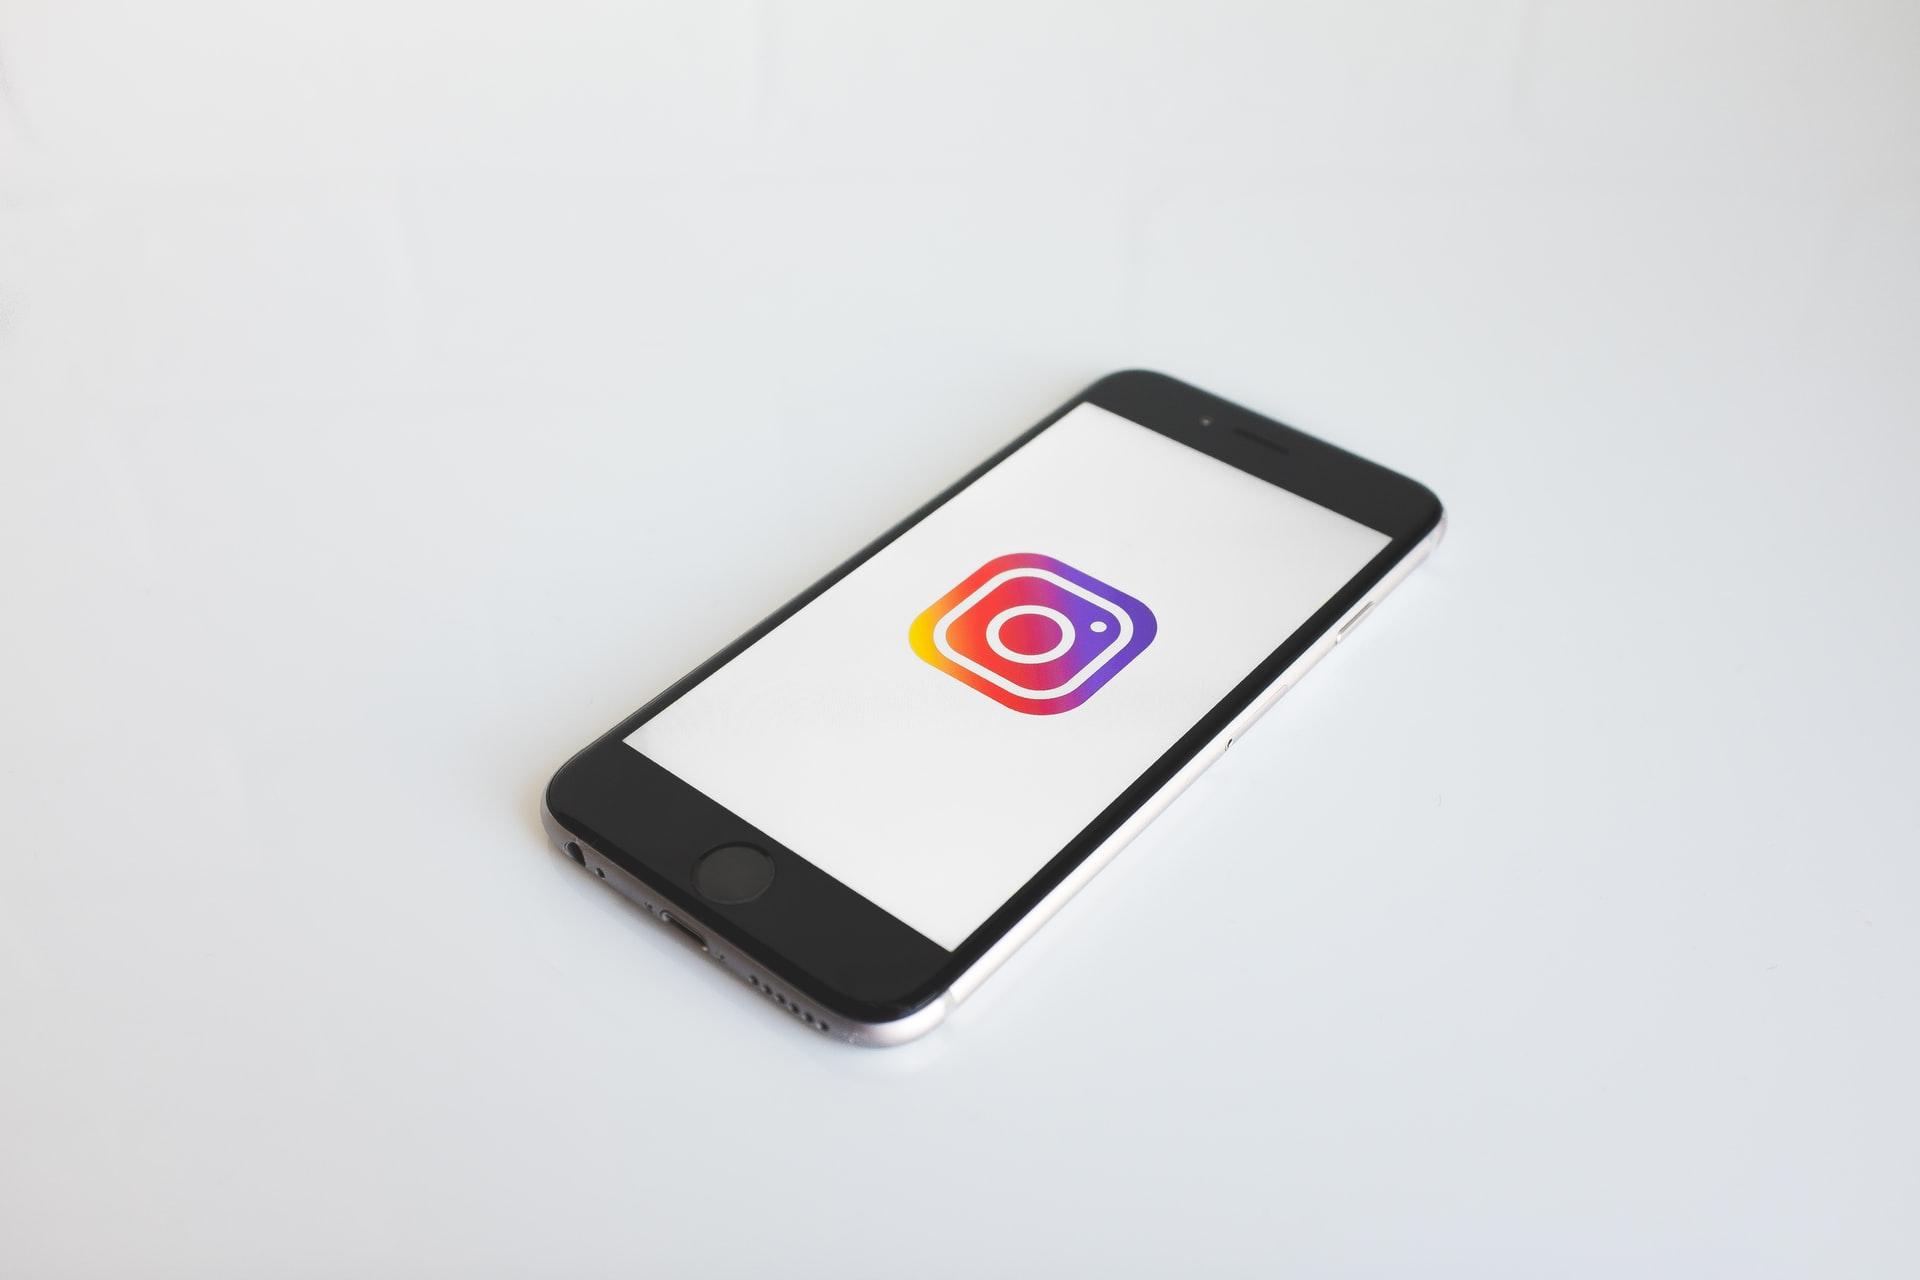 Instagram symbol on phone